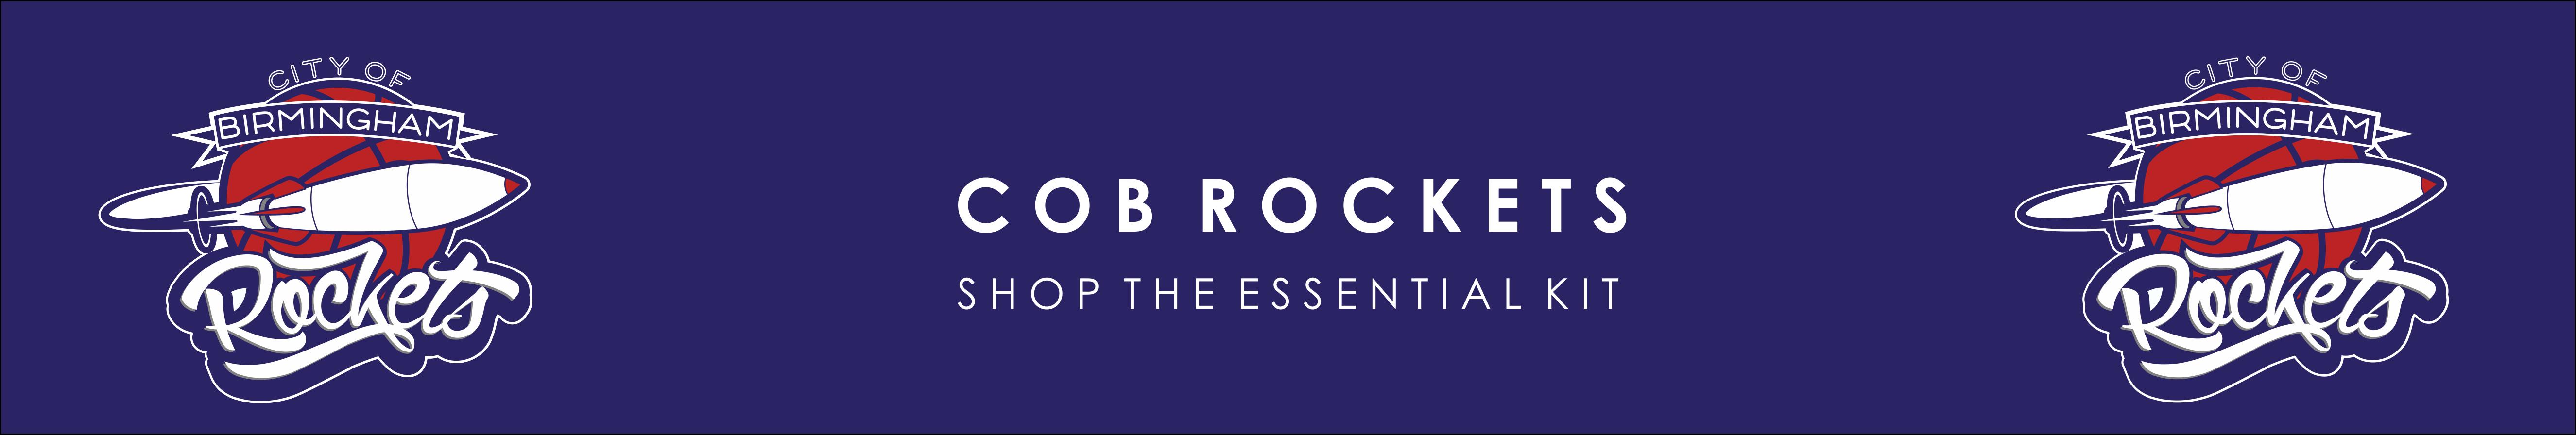 cob-rockets-front-banner.png